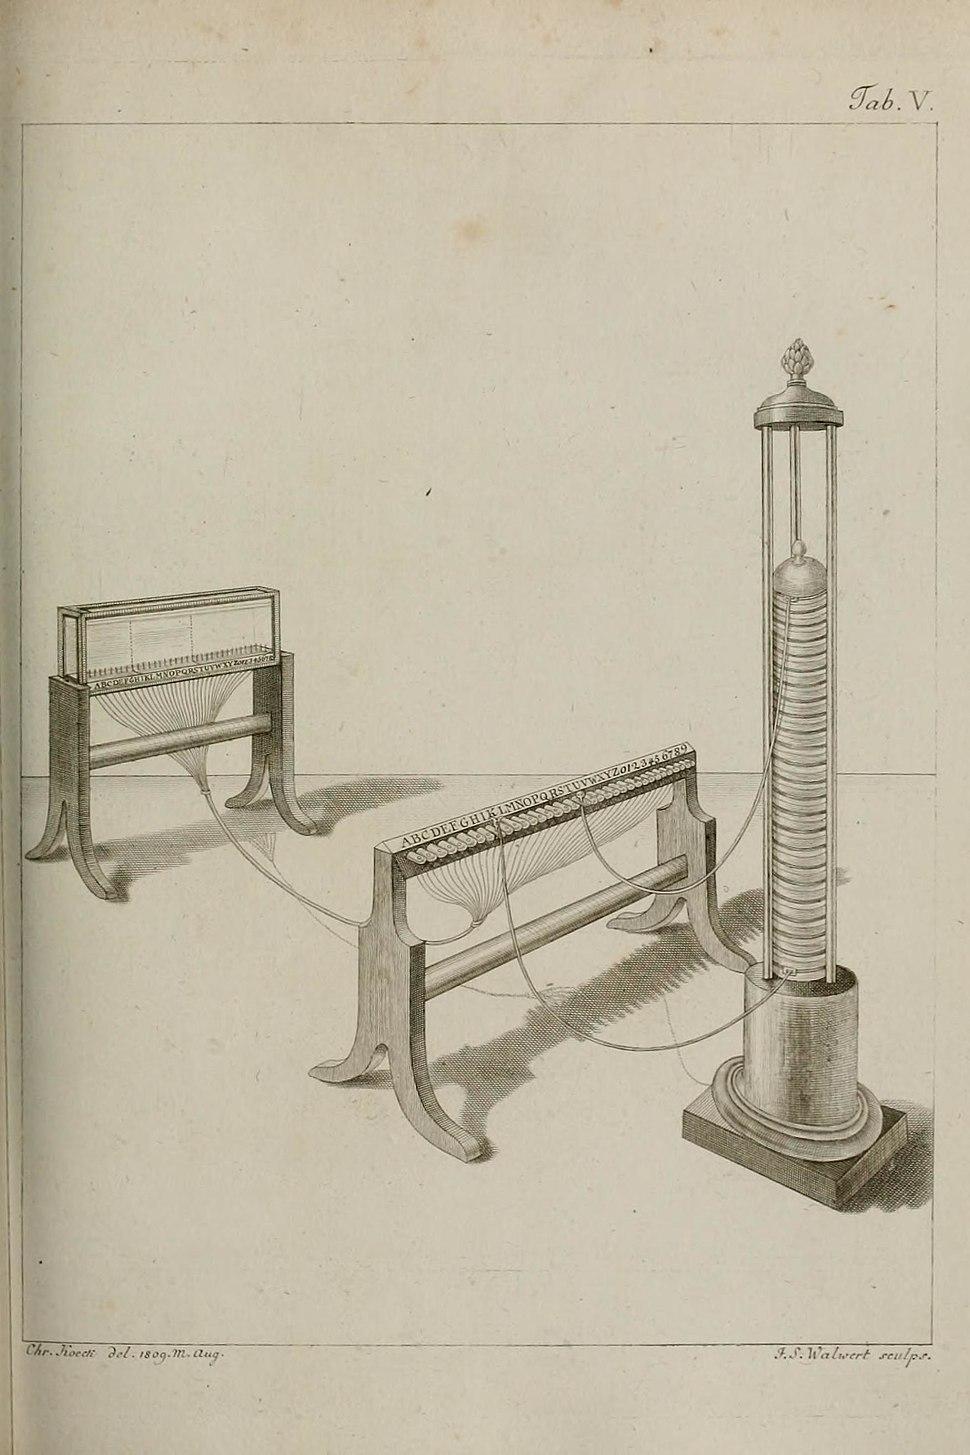 Soemmerring 1810 telegraph overview